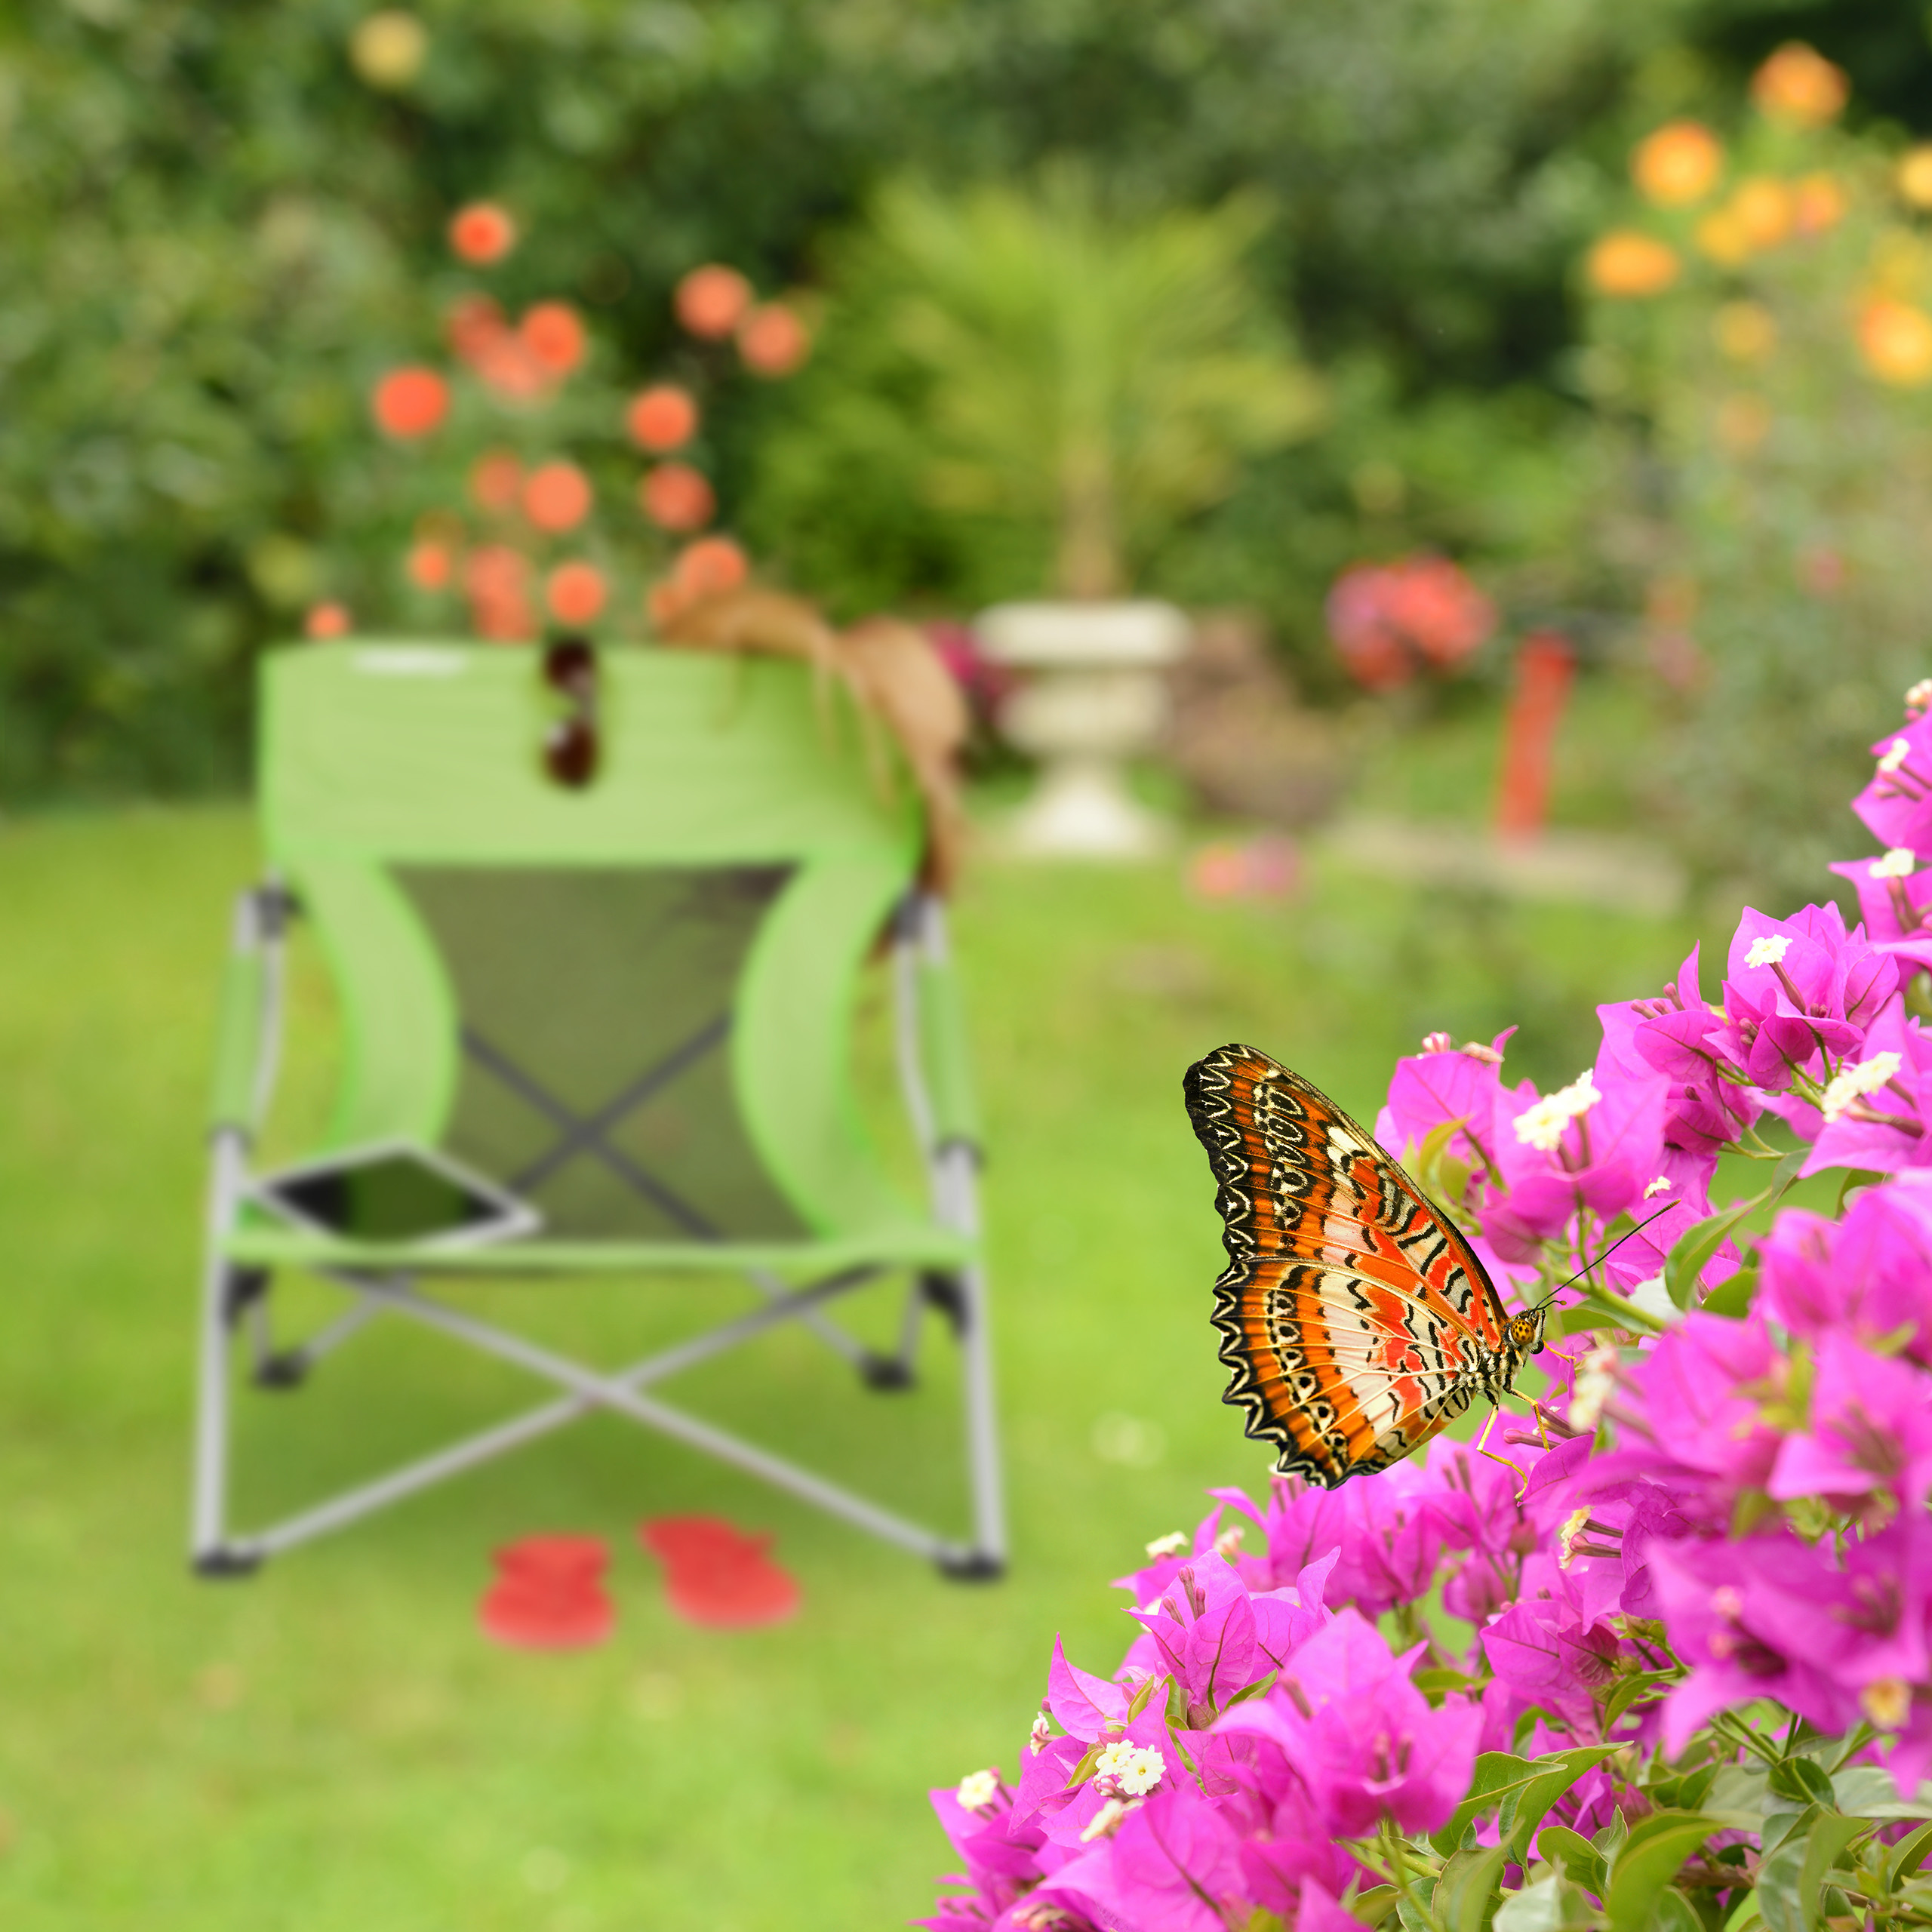 Playa silla plegable faltsessel picnic sillón beachstuhl camping Chair fácilmente